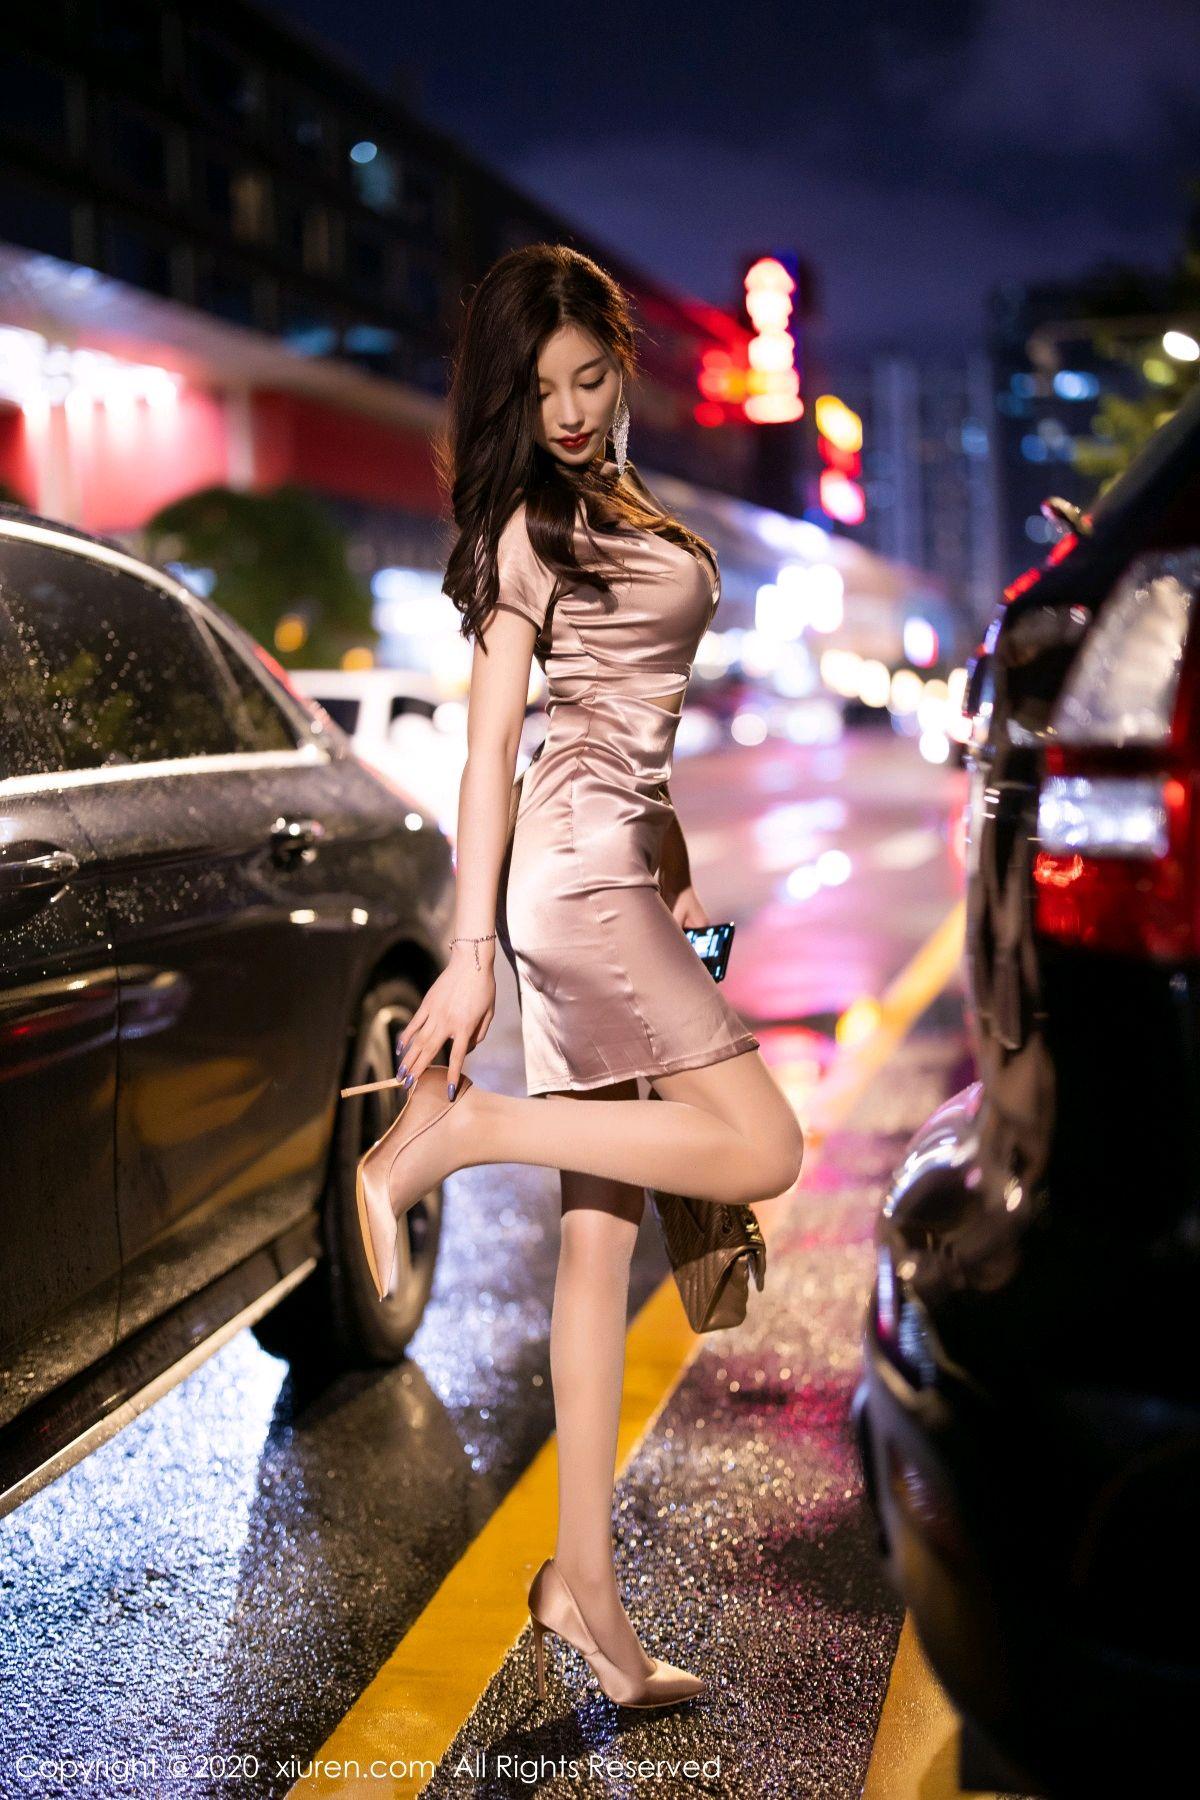 [XiuRen] Vol.2587 Yang Chen Chen 8P, Underwear, Xiuren, Yang Chen Chen